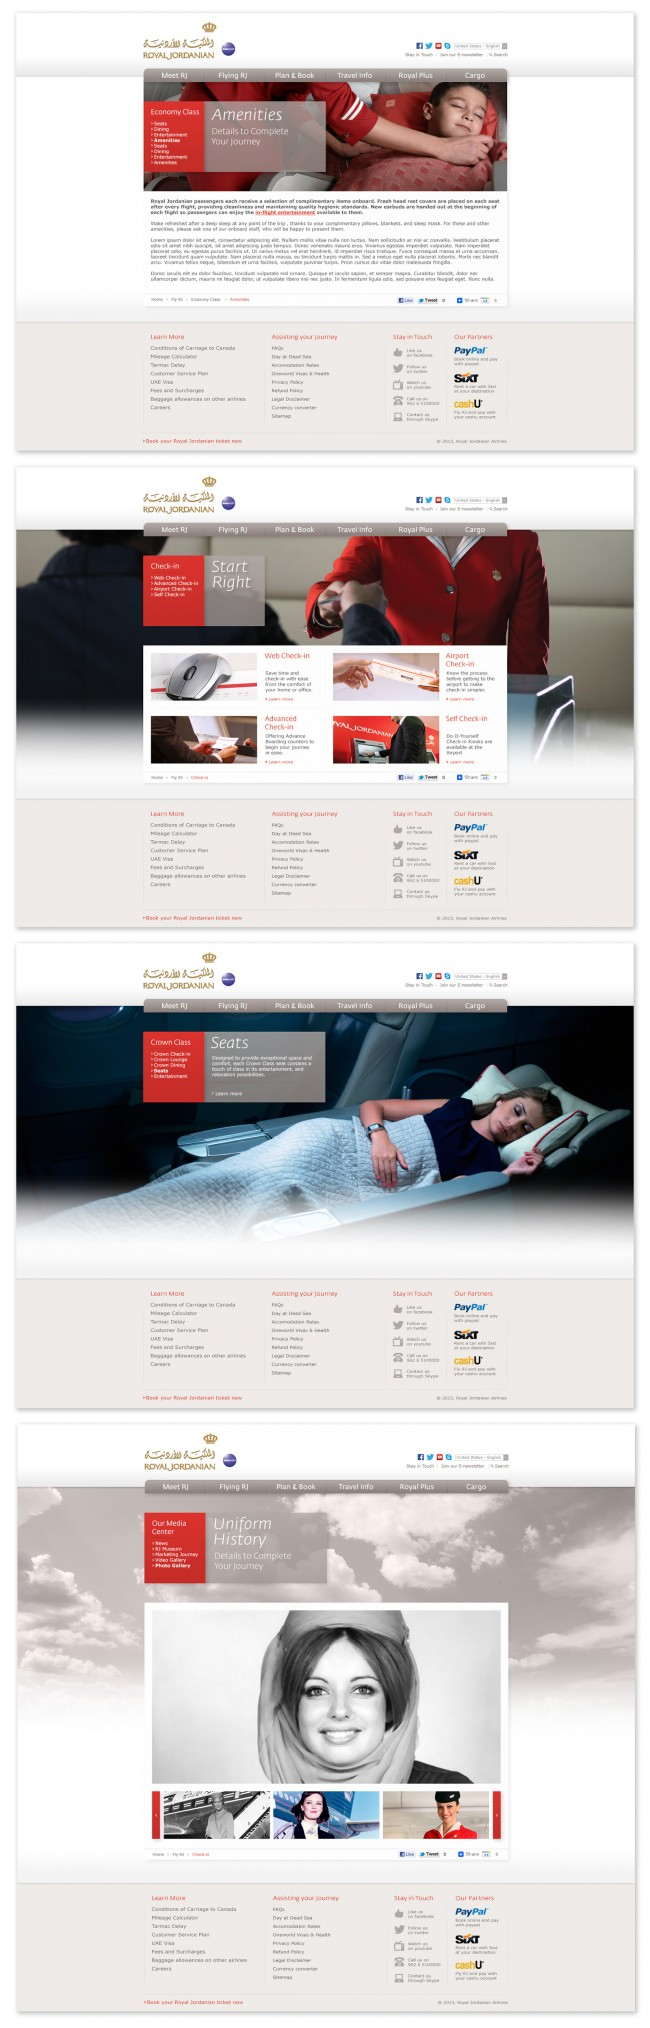 3_Royal_jordanian_online_branding